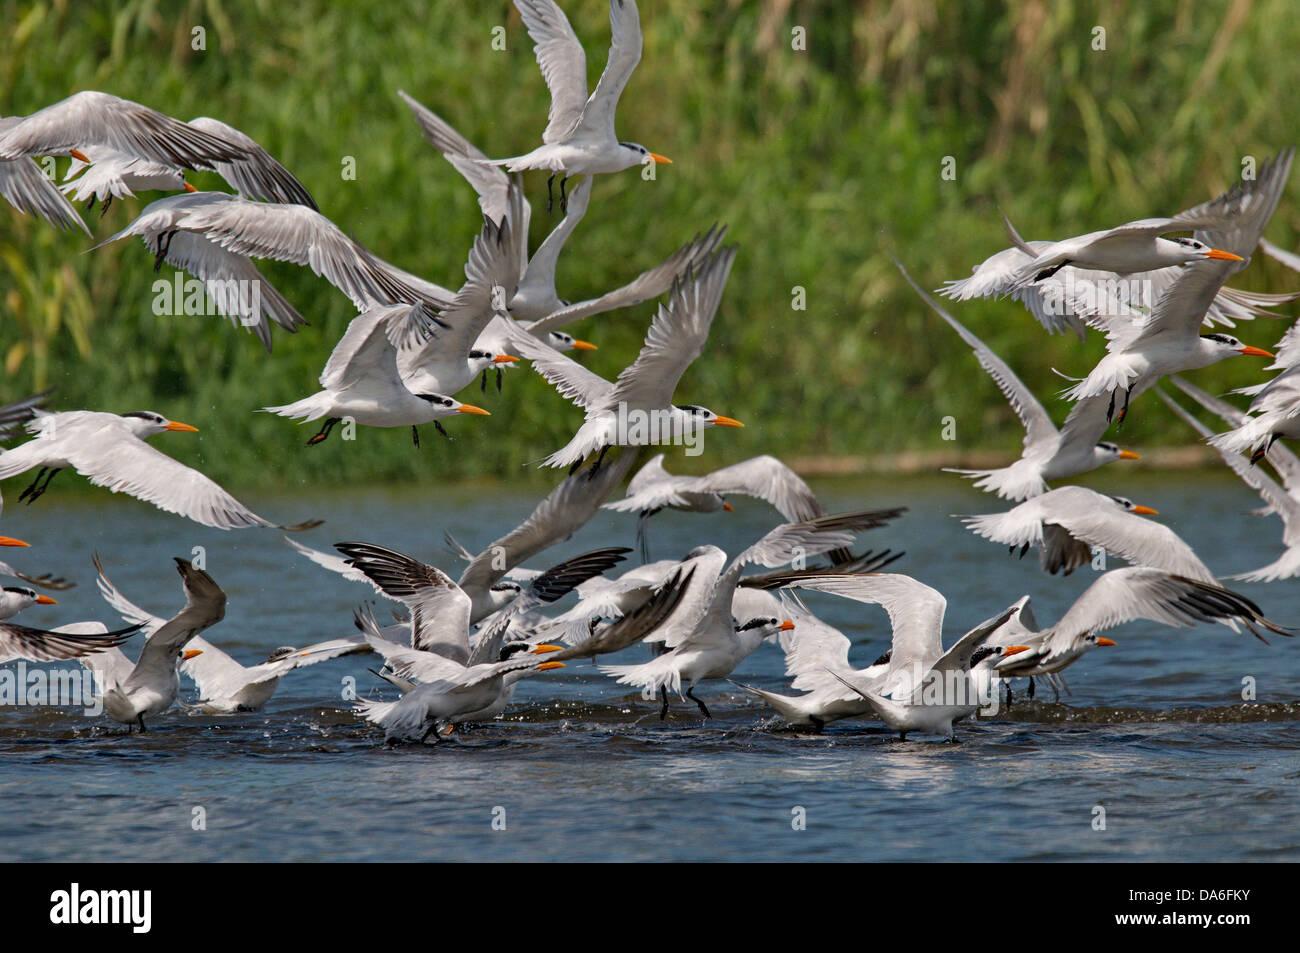 tern, terns, Sternidae, Laridae, bird, birds, animal, animals, fauna, wildlife, wild animal, nature, Costa Rica, - Stock Image